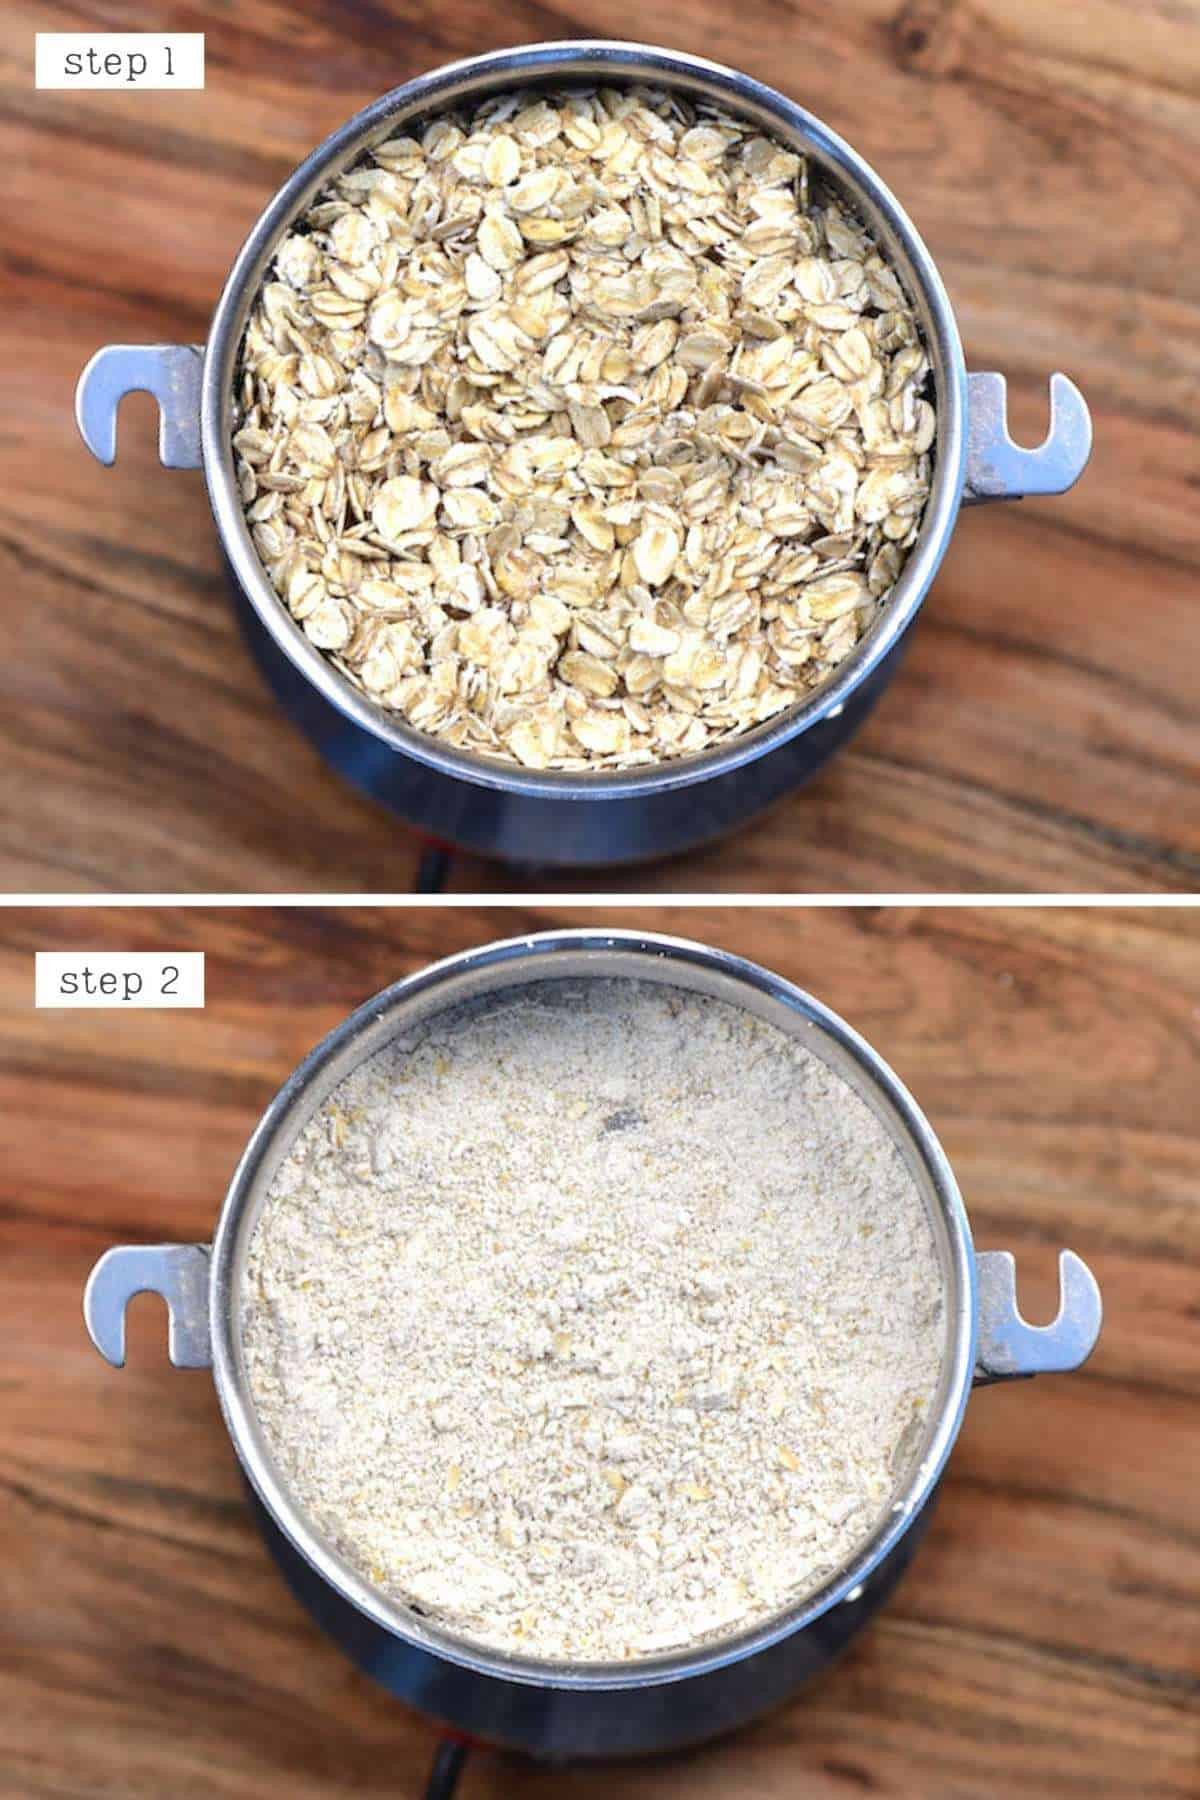 Steps for grinding oats